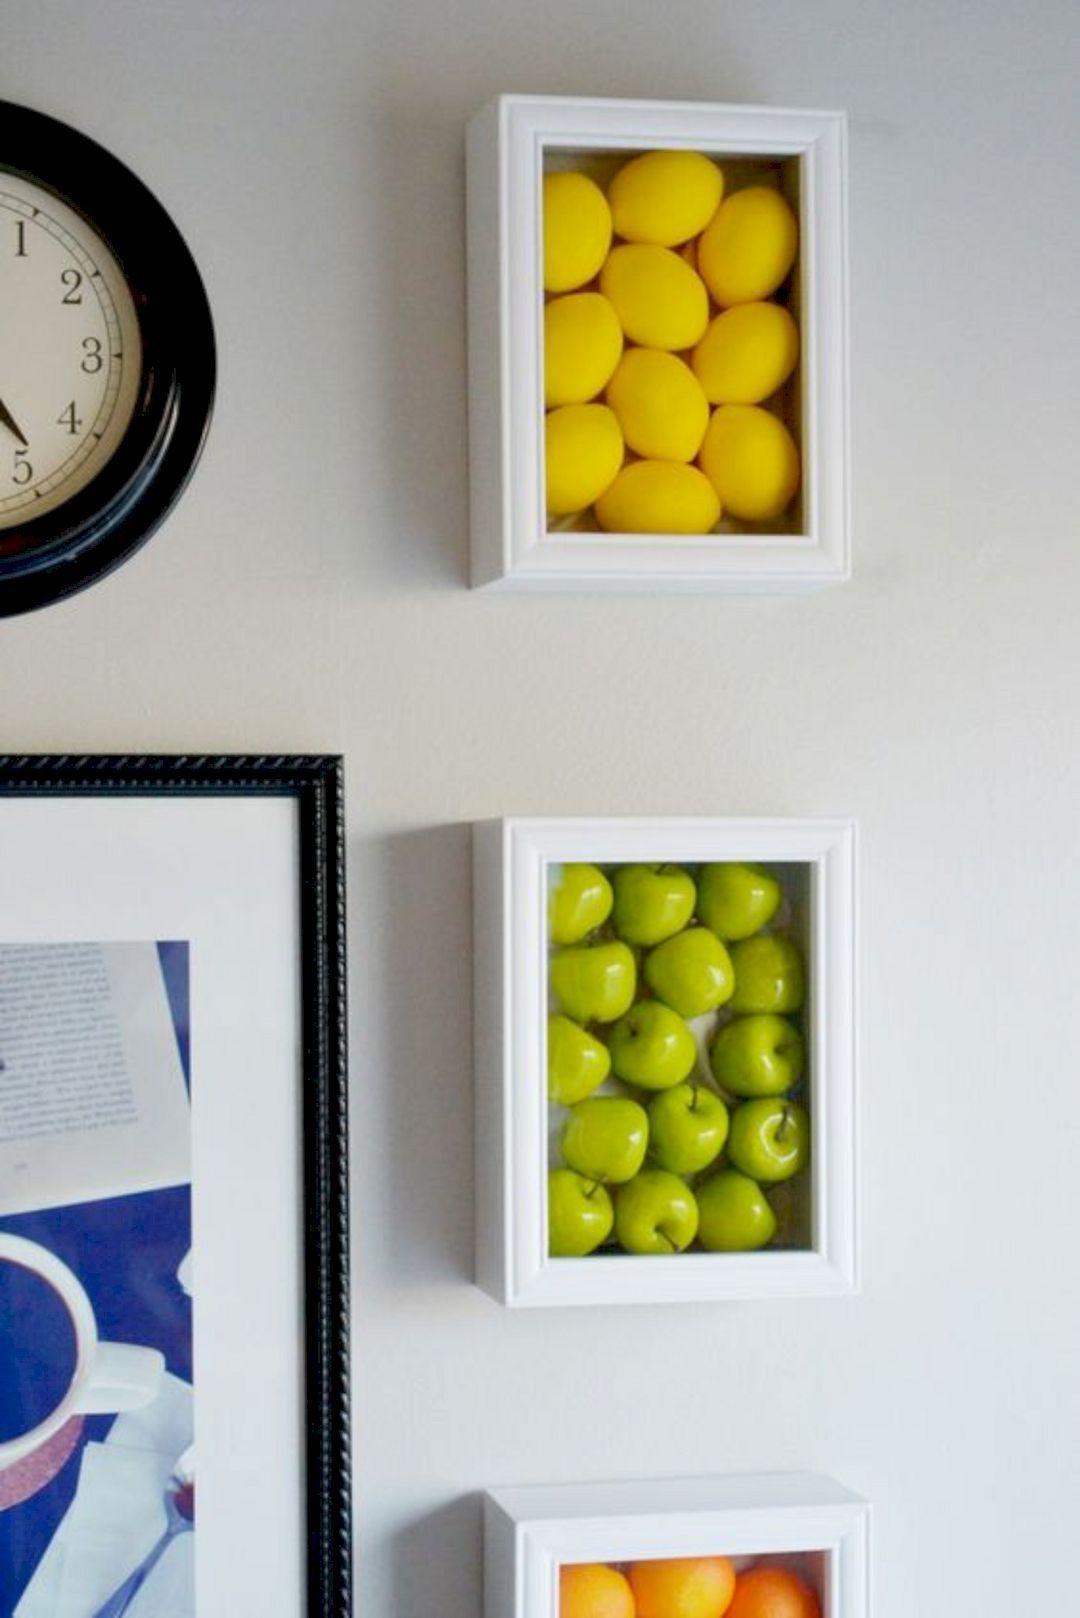 5 Top Small Kitchen Decorating Ideas Diy Decor Wall Colors Design